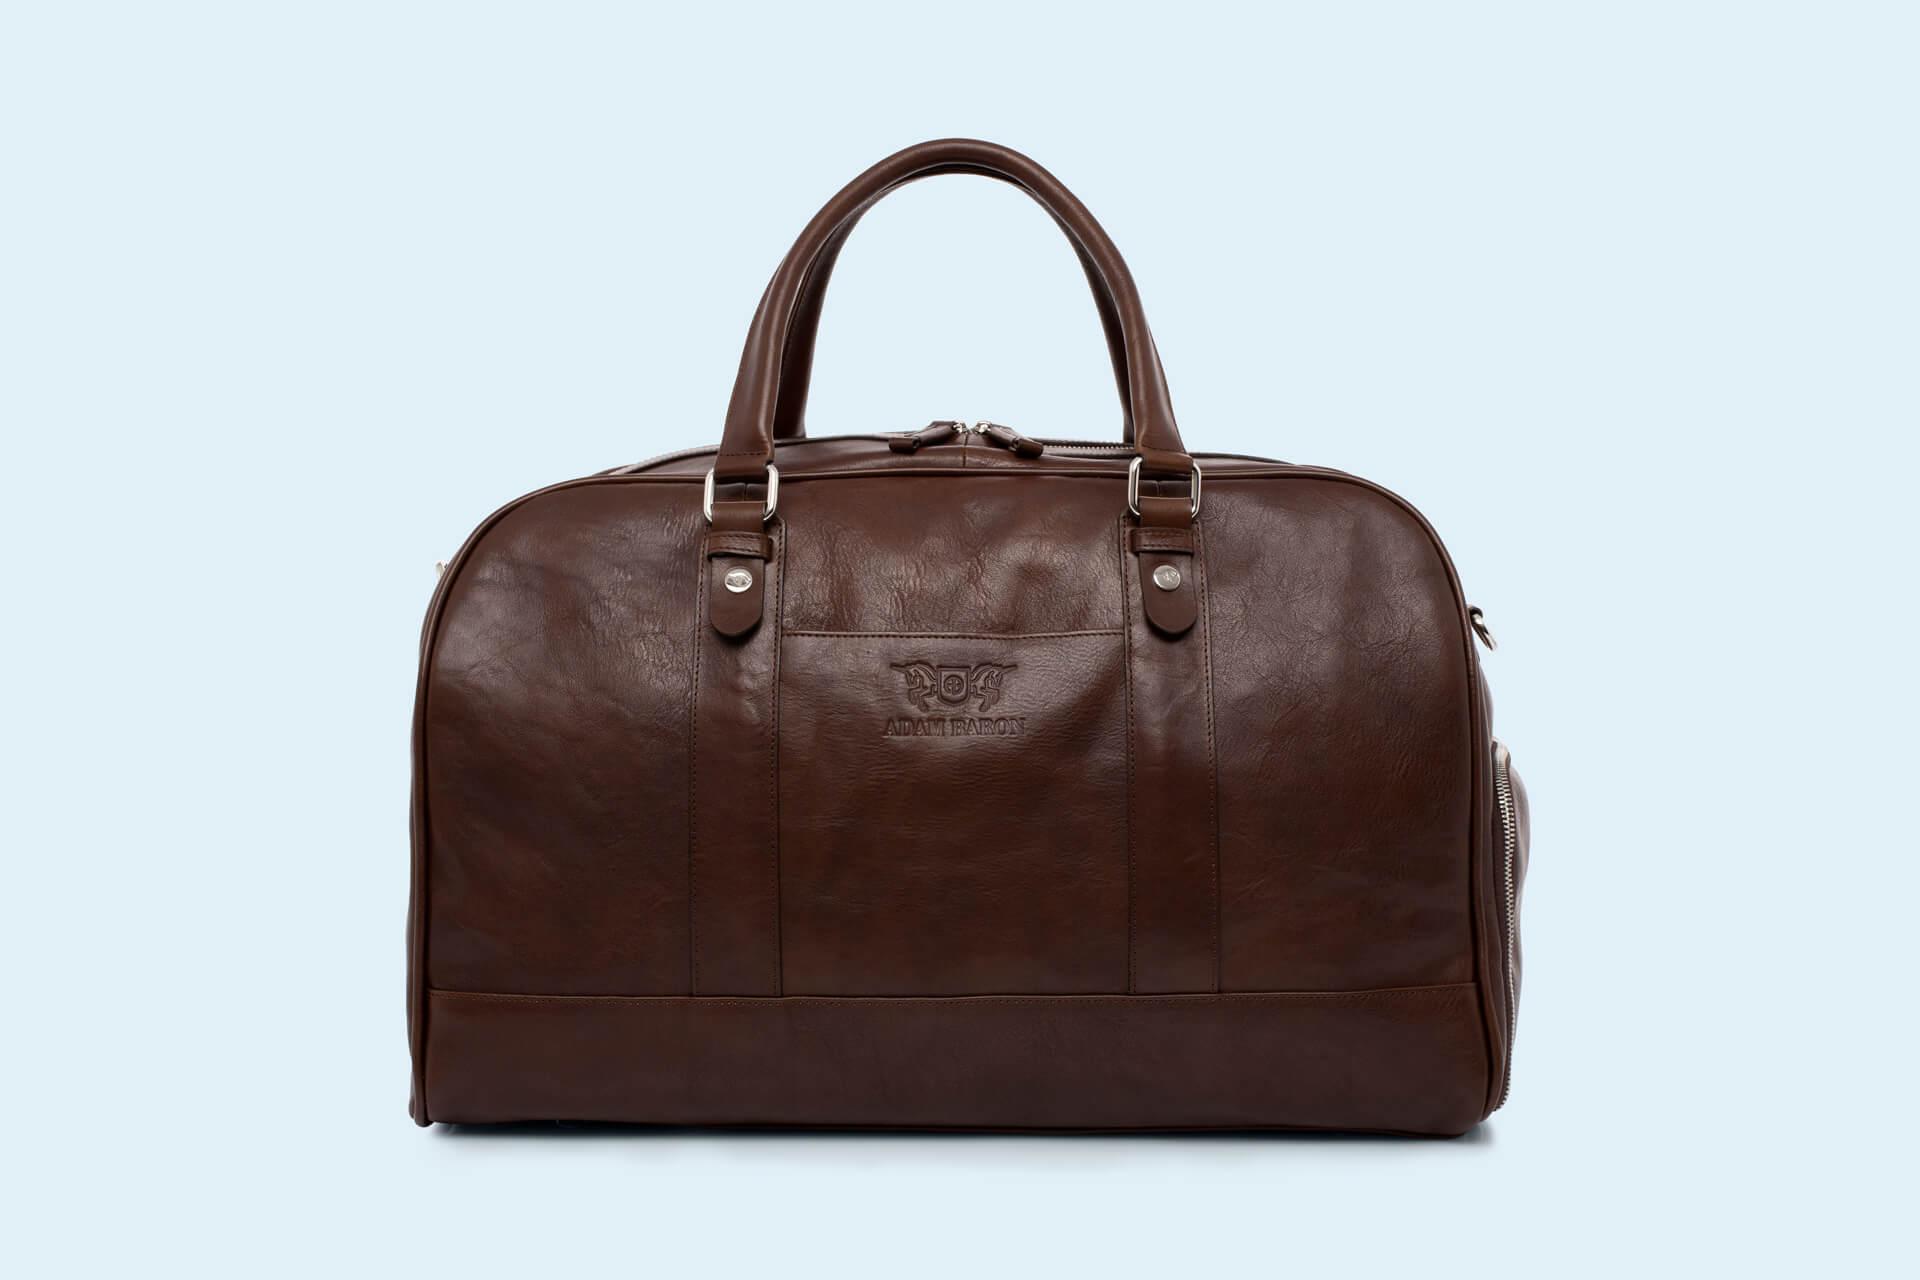 7ae78cbbc894d Skórzana torba podróżna - Verity Weekend brown